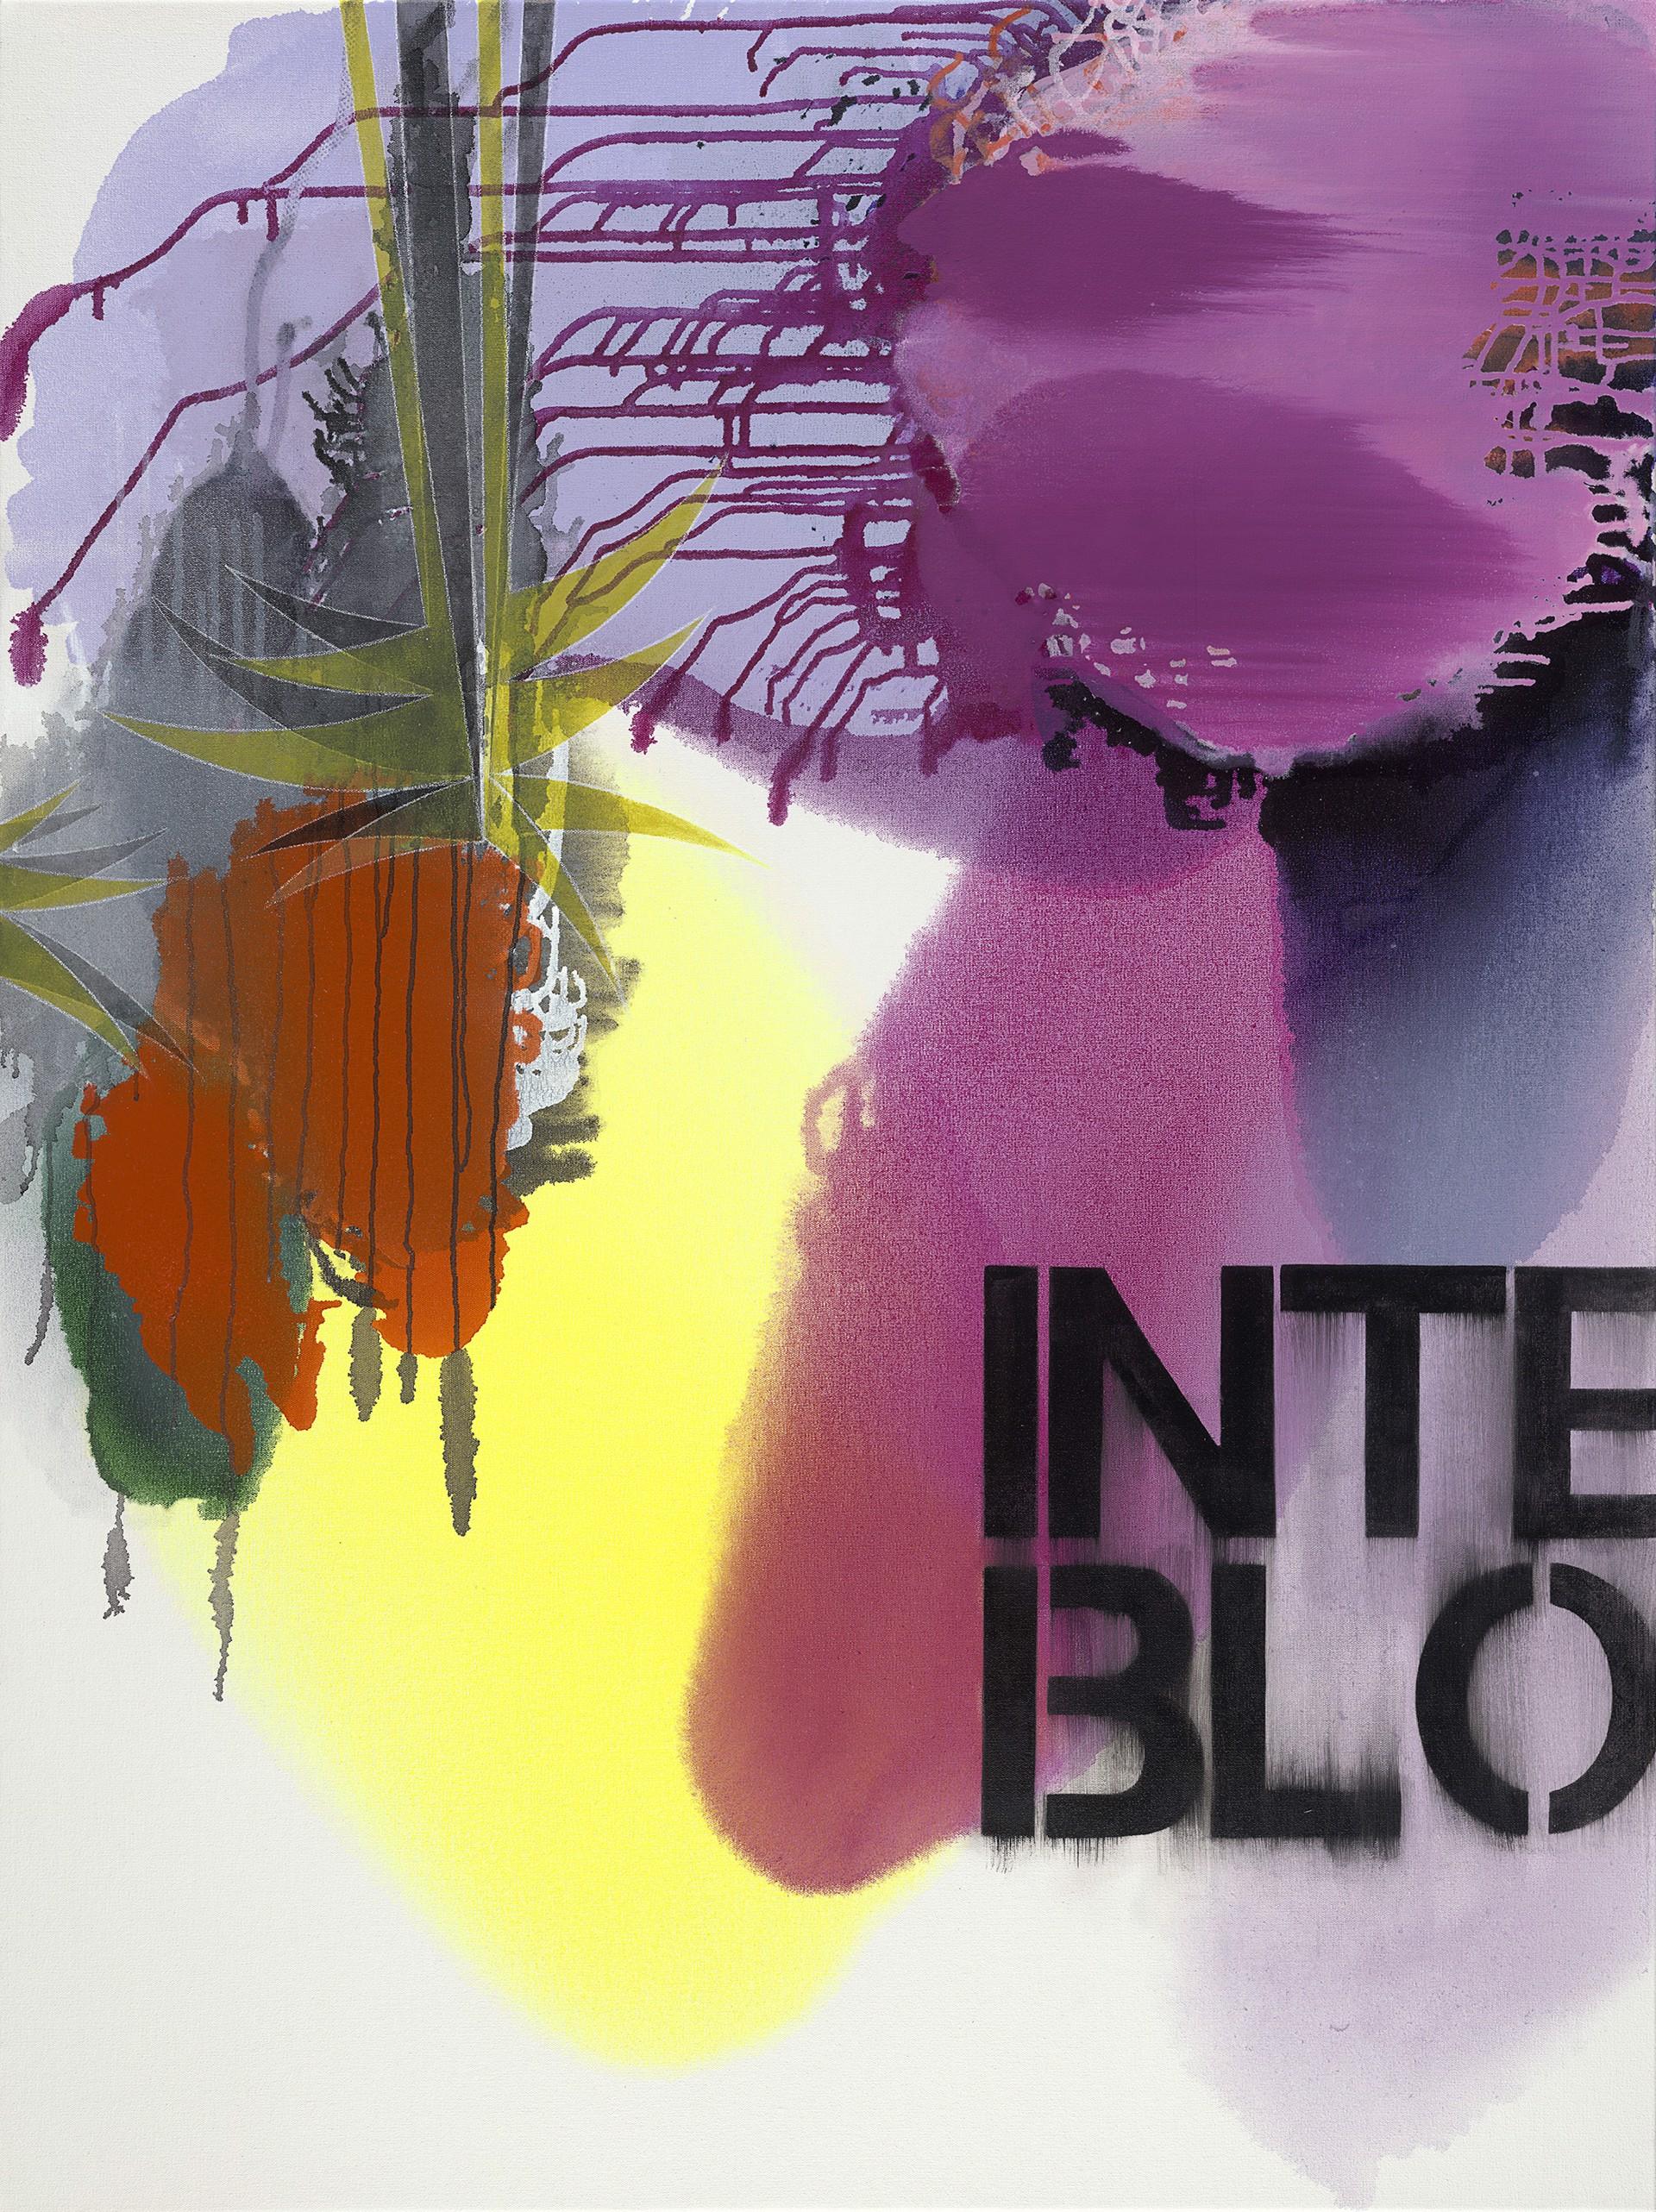 Intemperate Blossoming by Kuzana Ogg